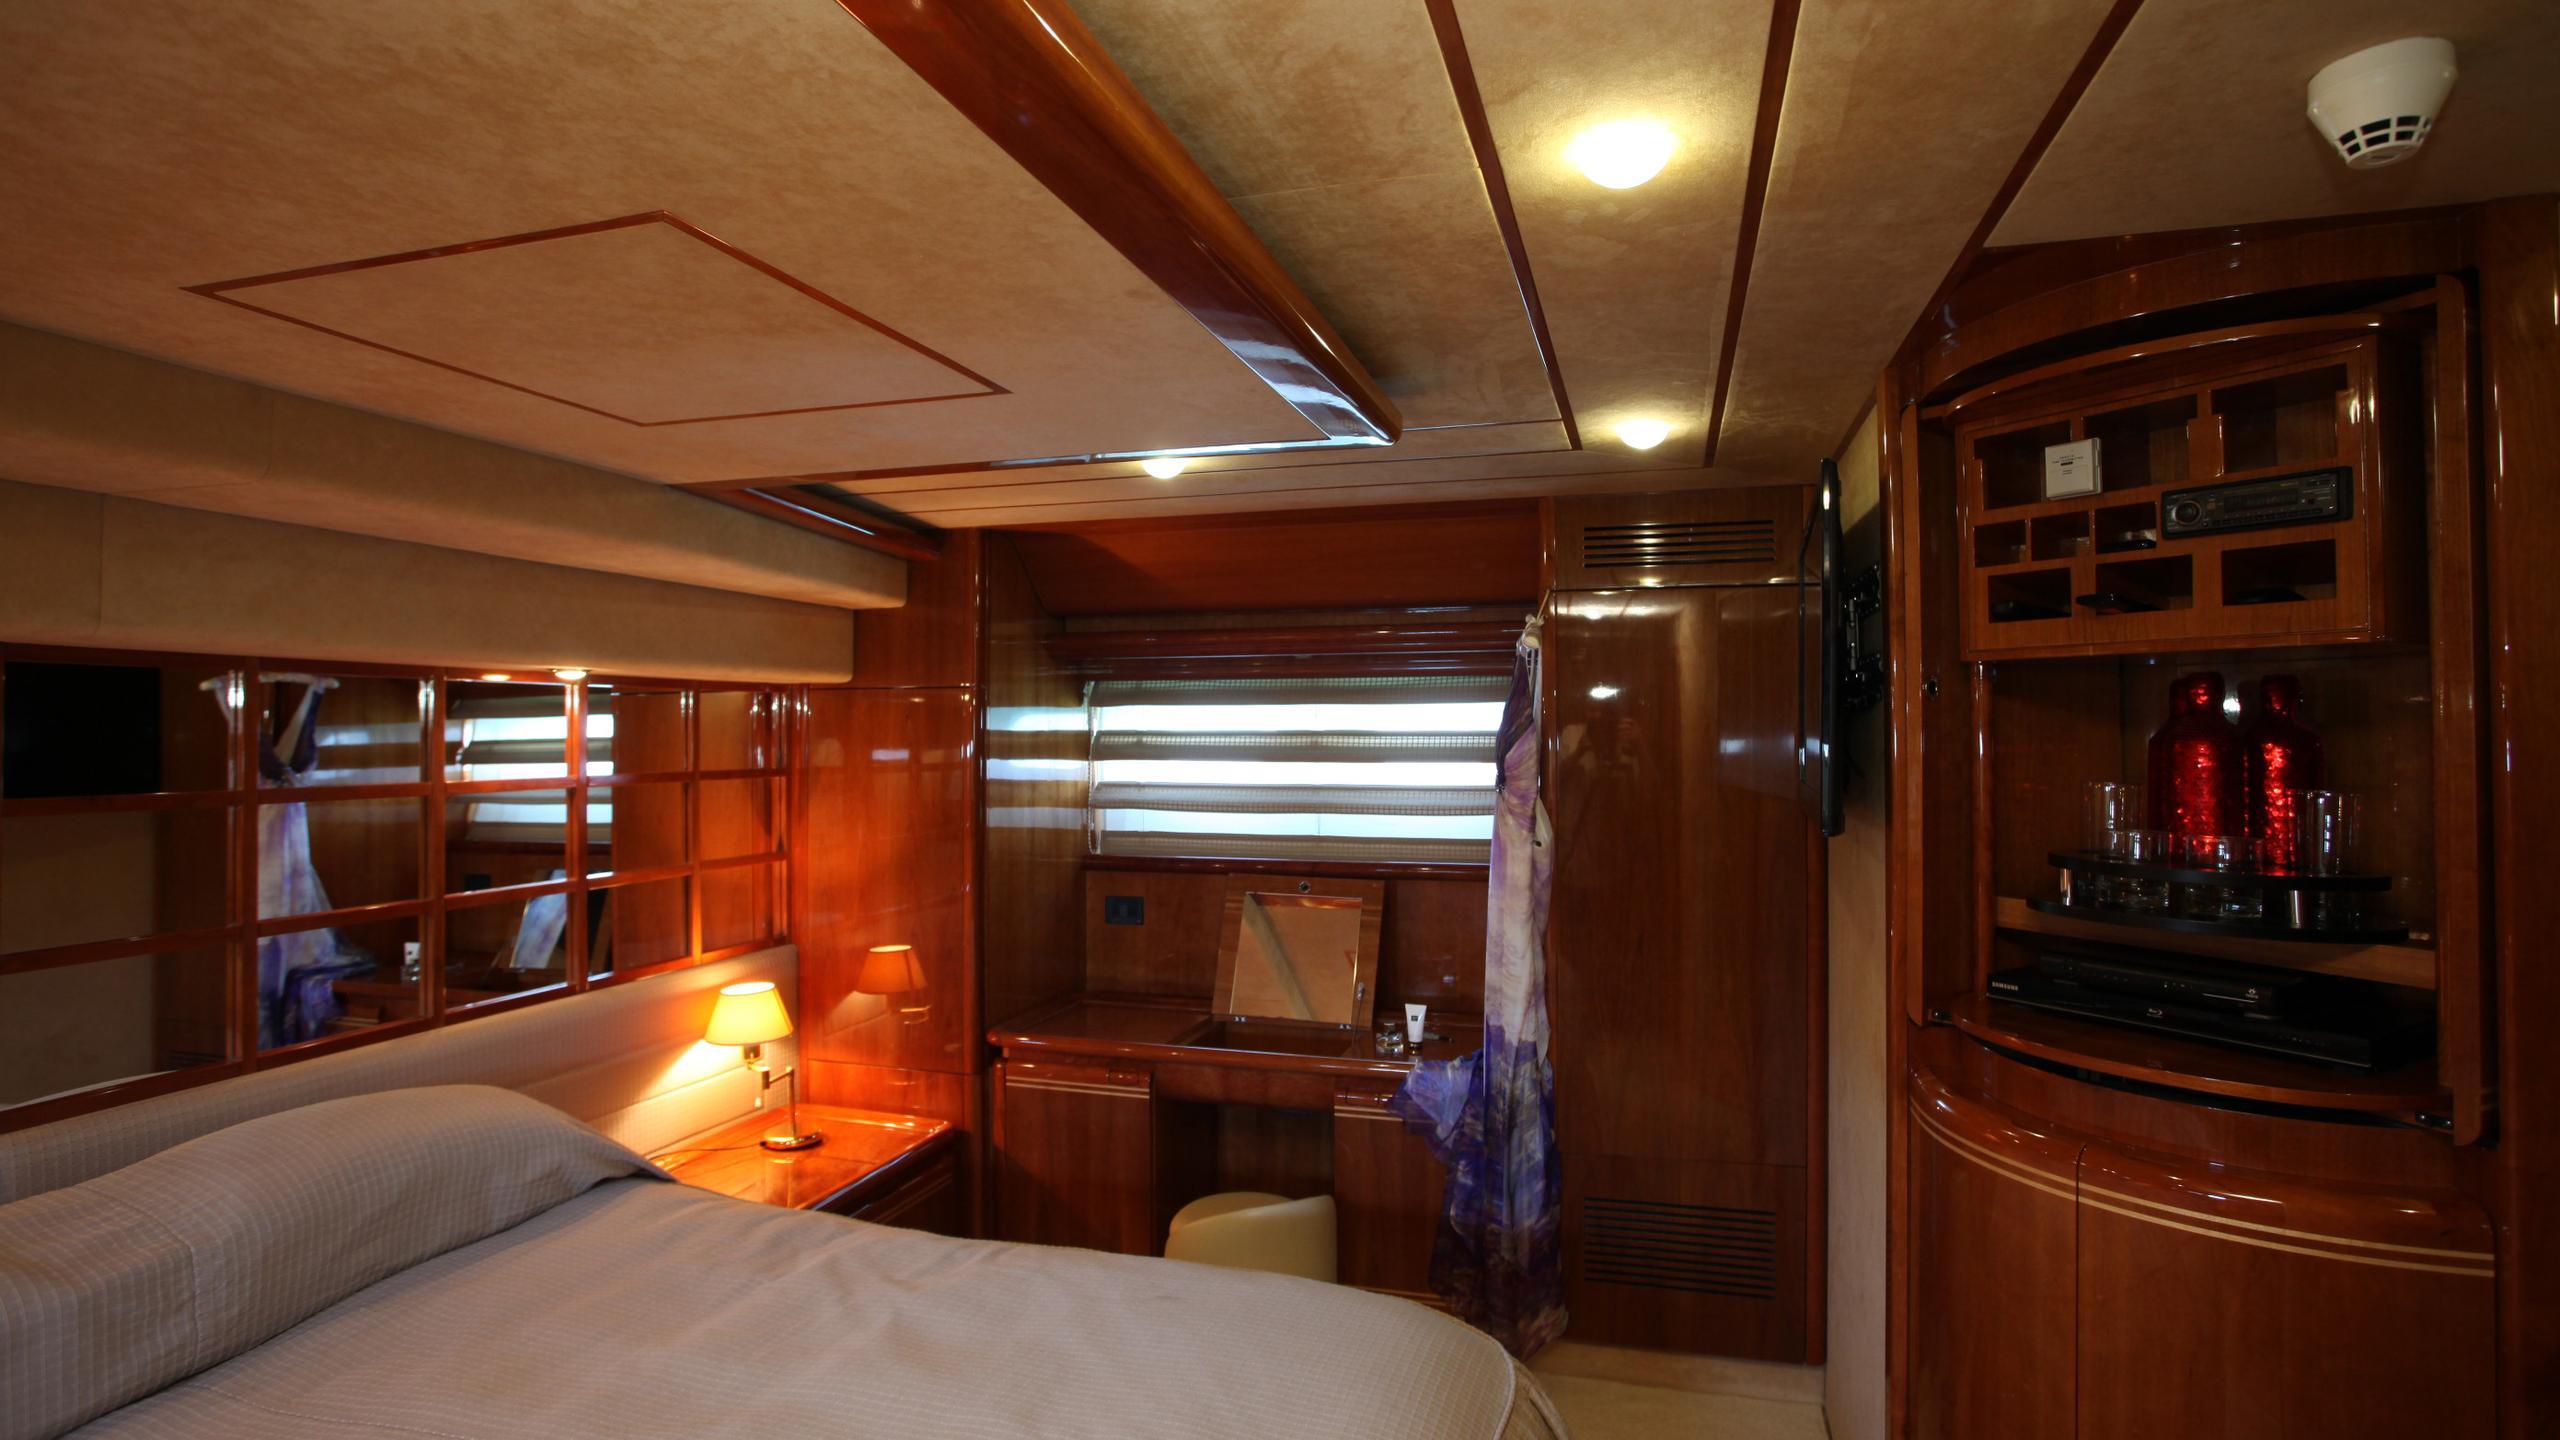 kentavros-ii-yacht-master-cabin